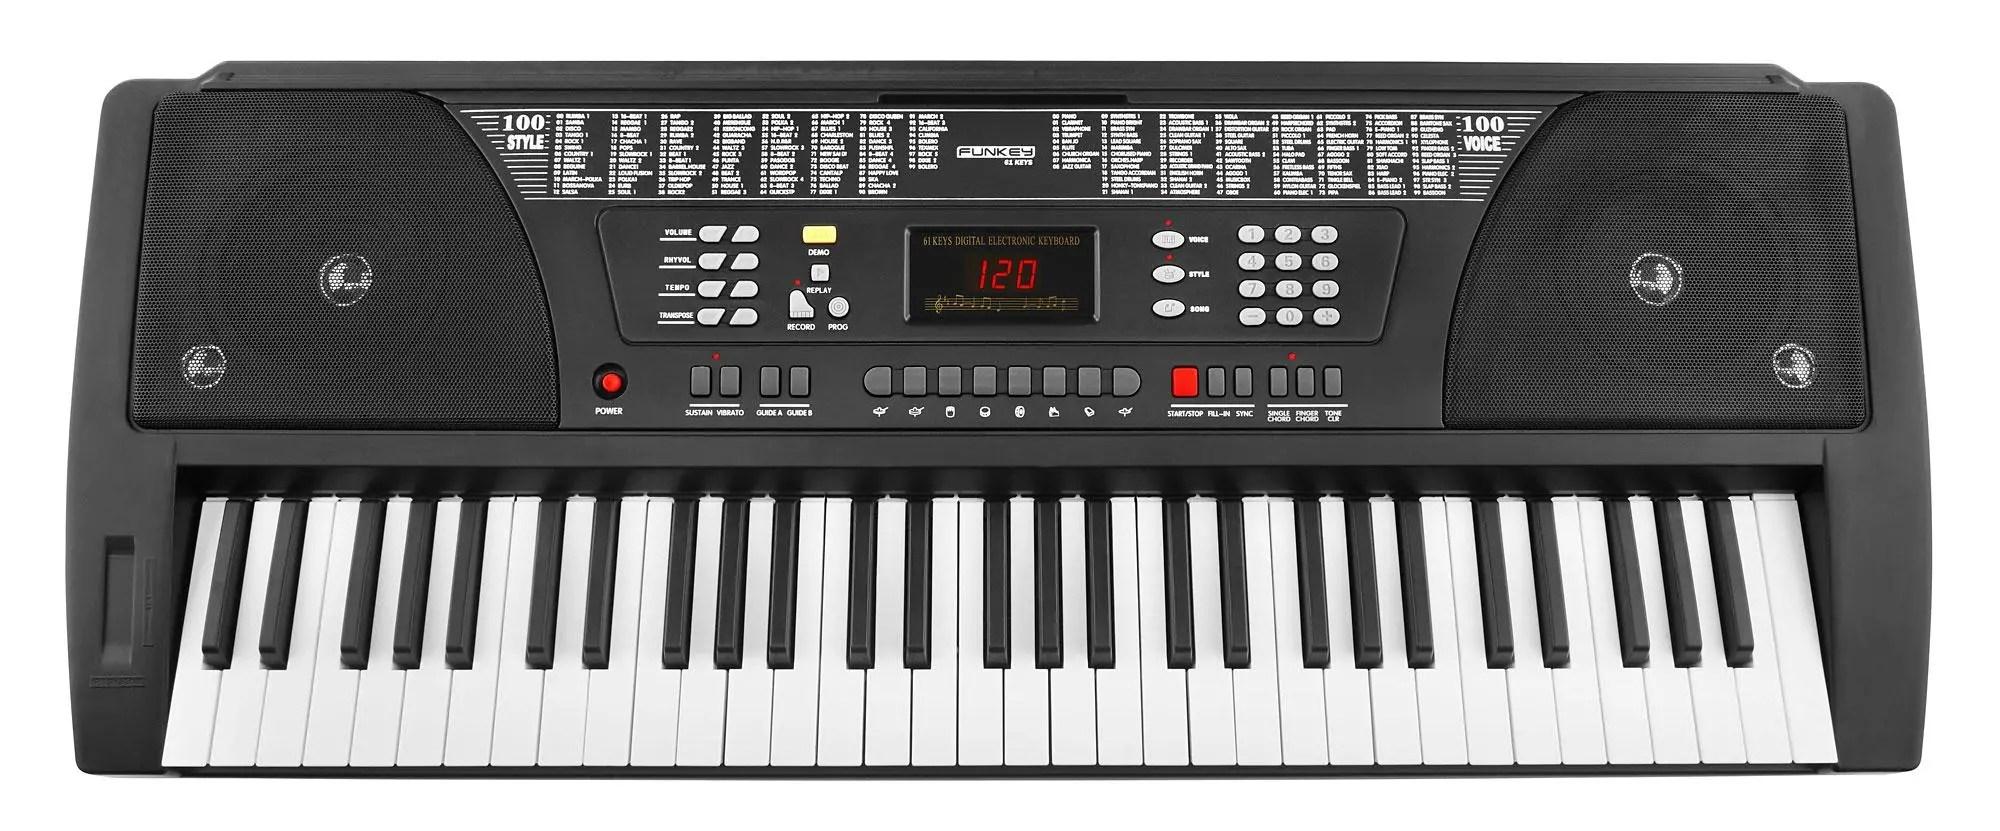 Funkey 61 Keyboard Black Set Of 7 Incl Keyboard Stand Bench